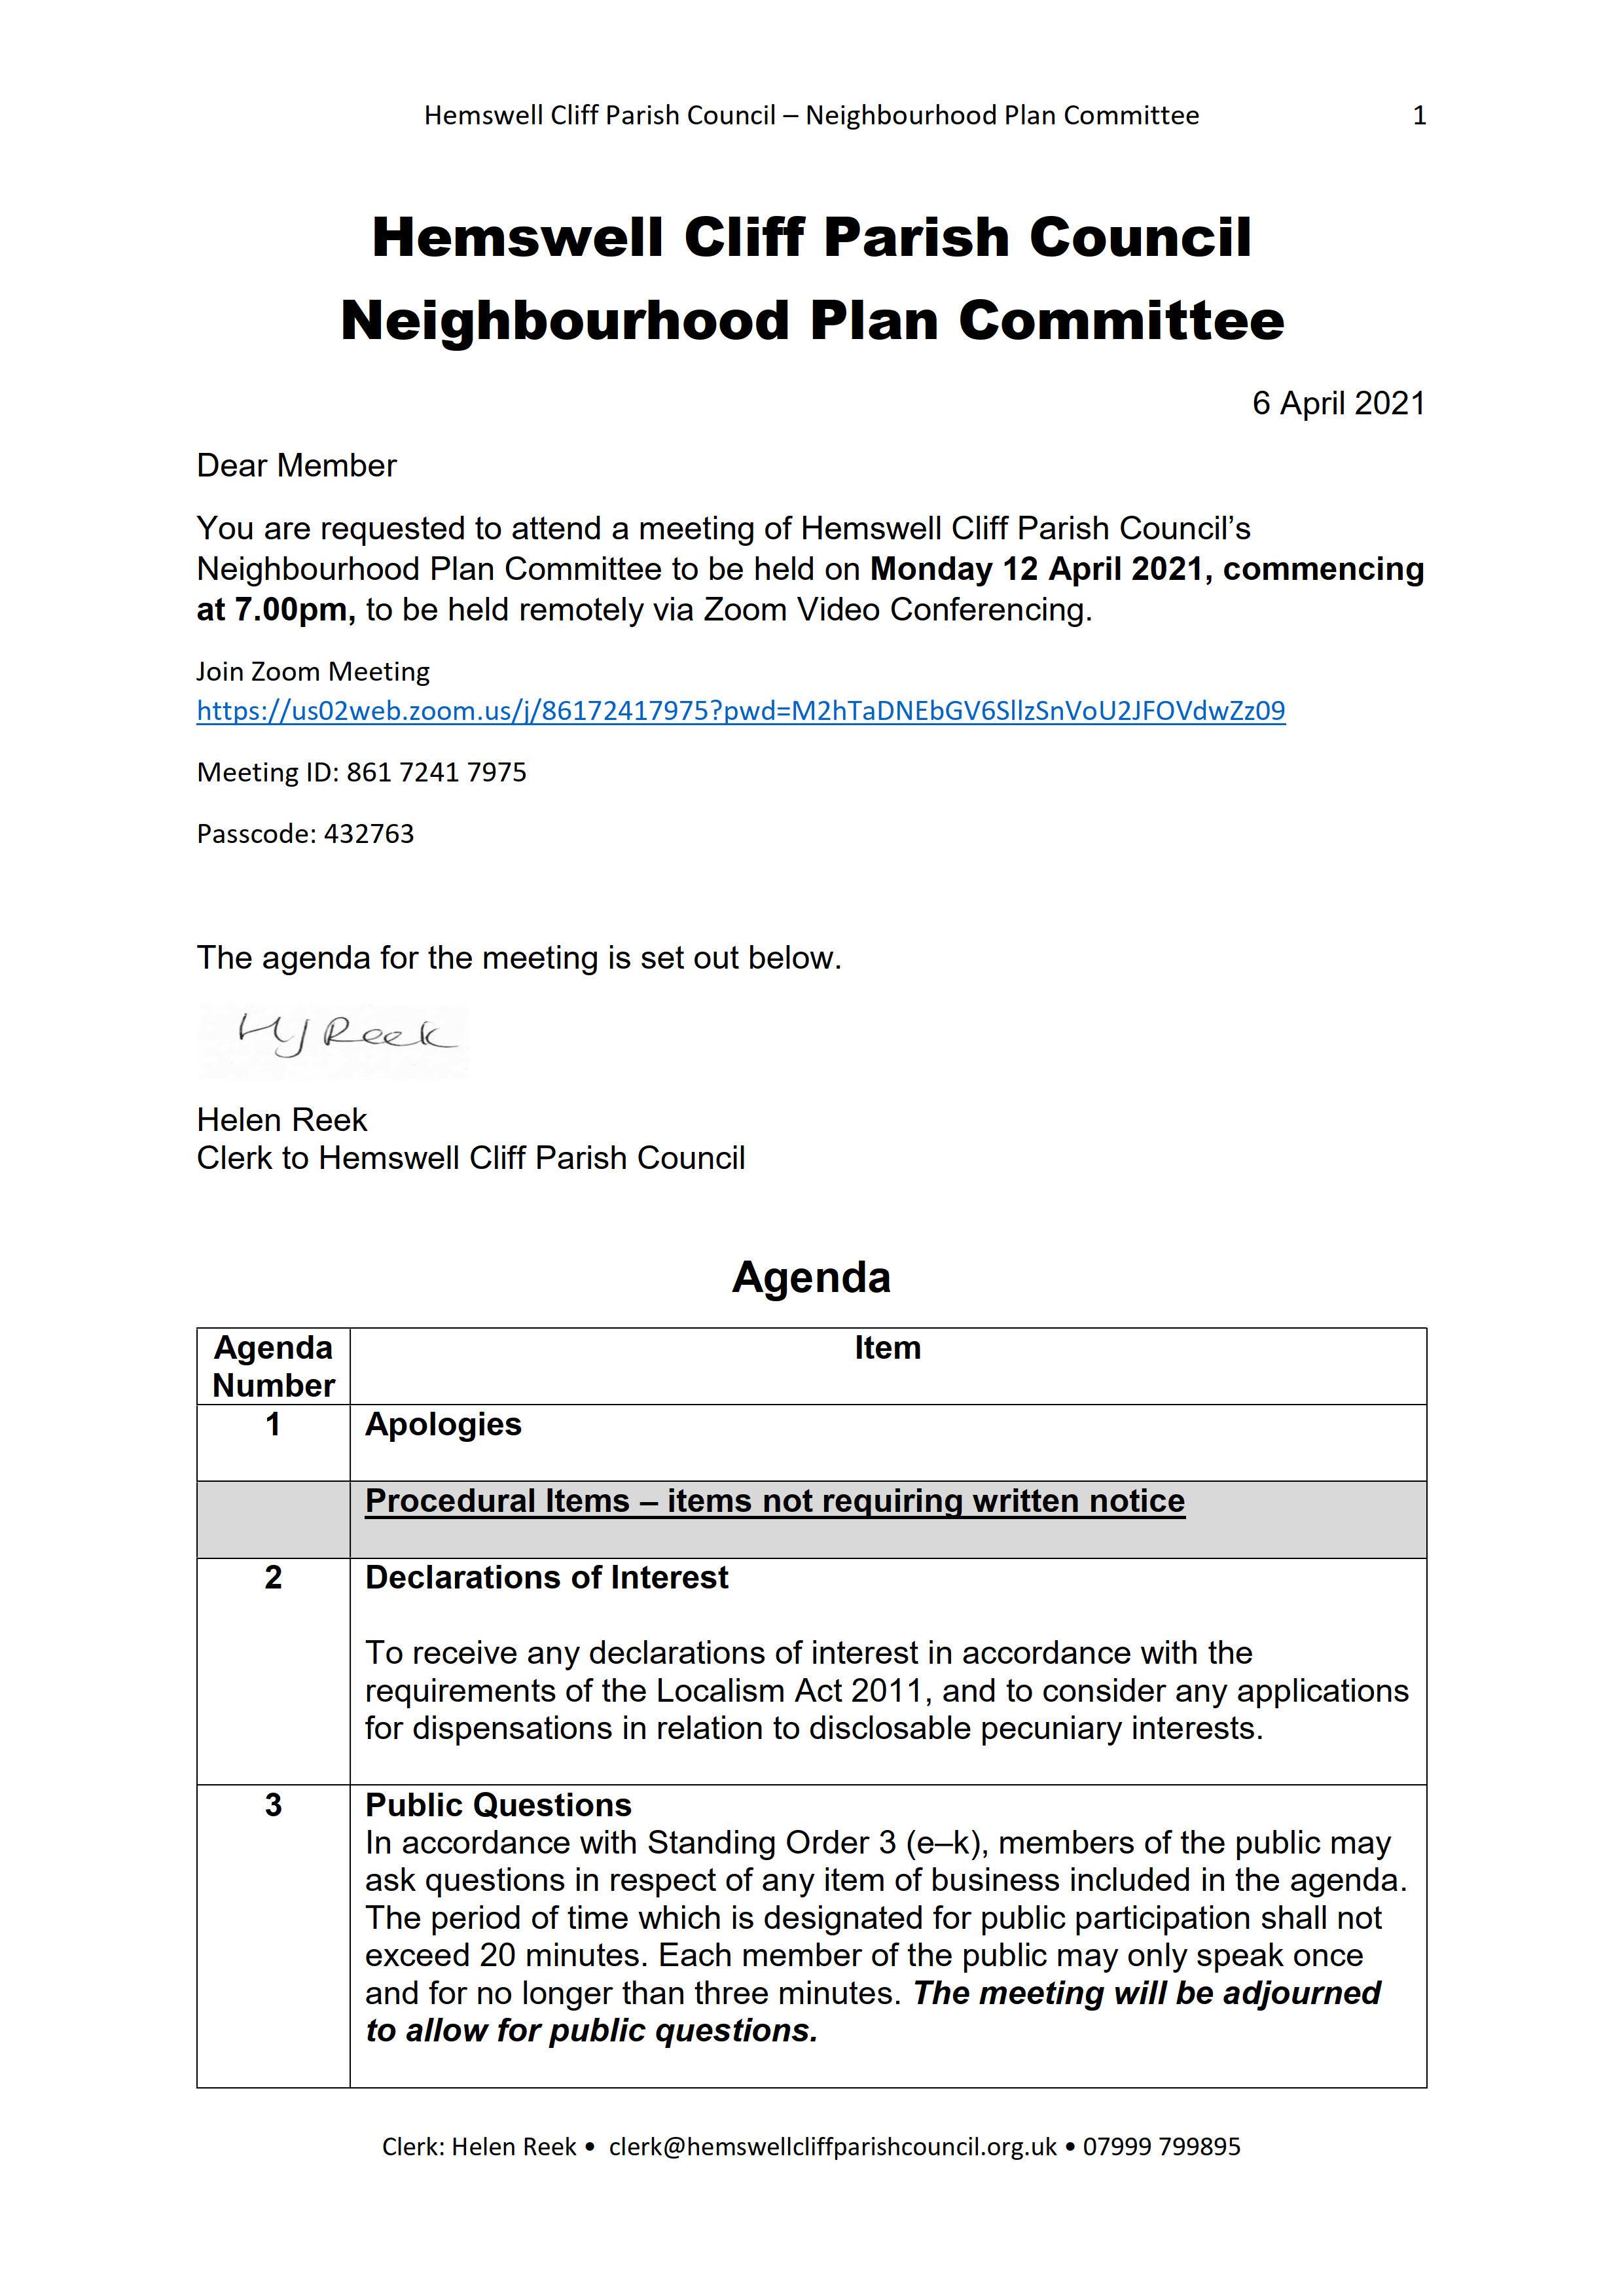 HCPC_NPC_Agenda_12.04.21_1.jpg